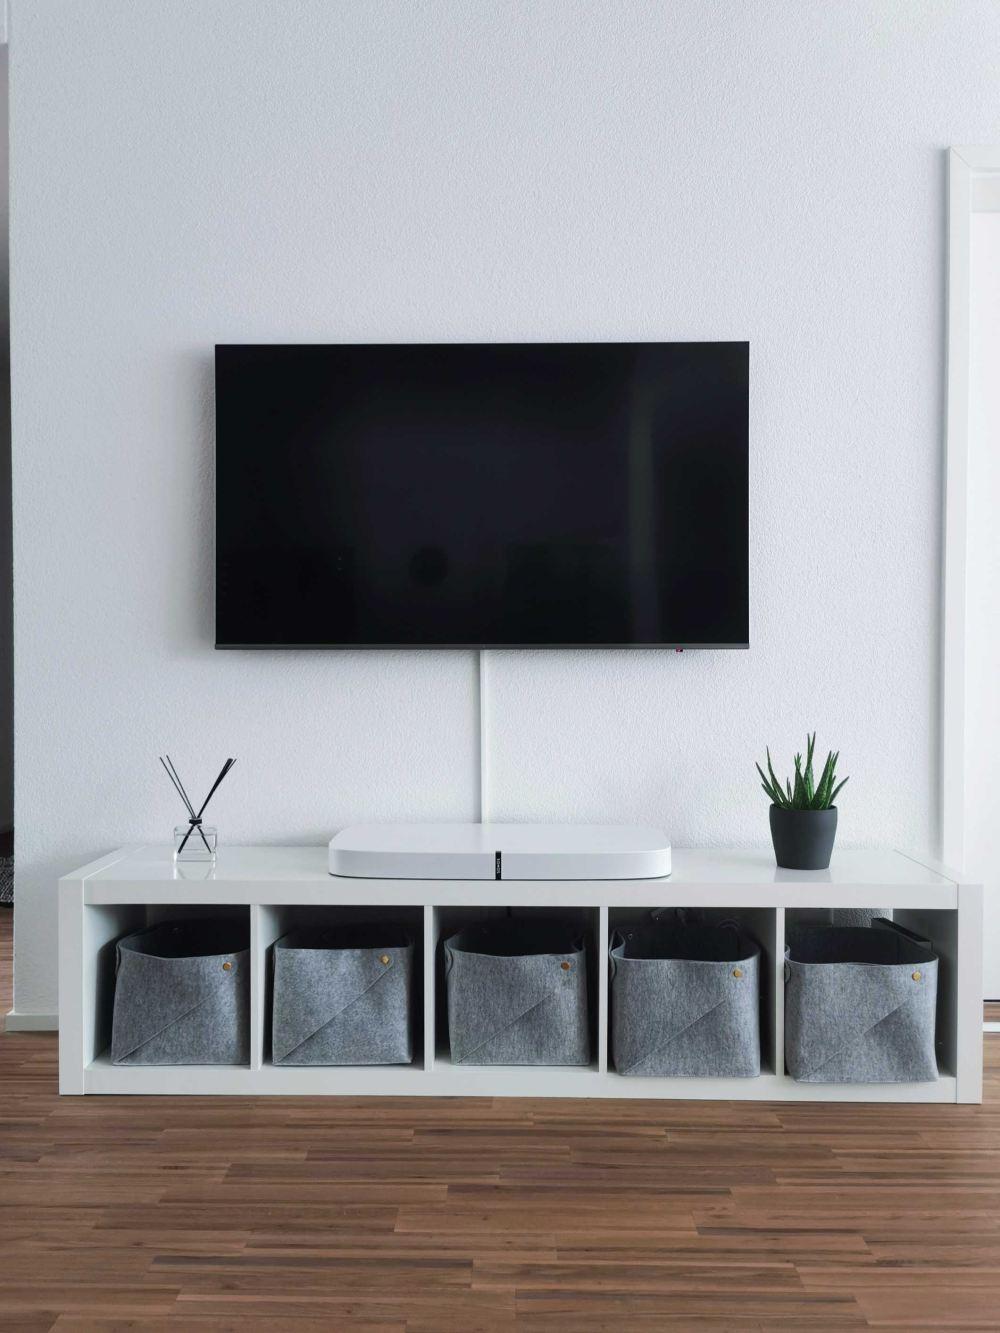 turned-off flat screen TV